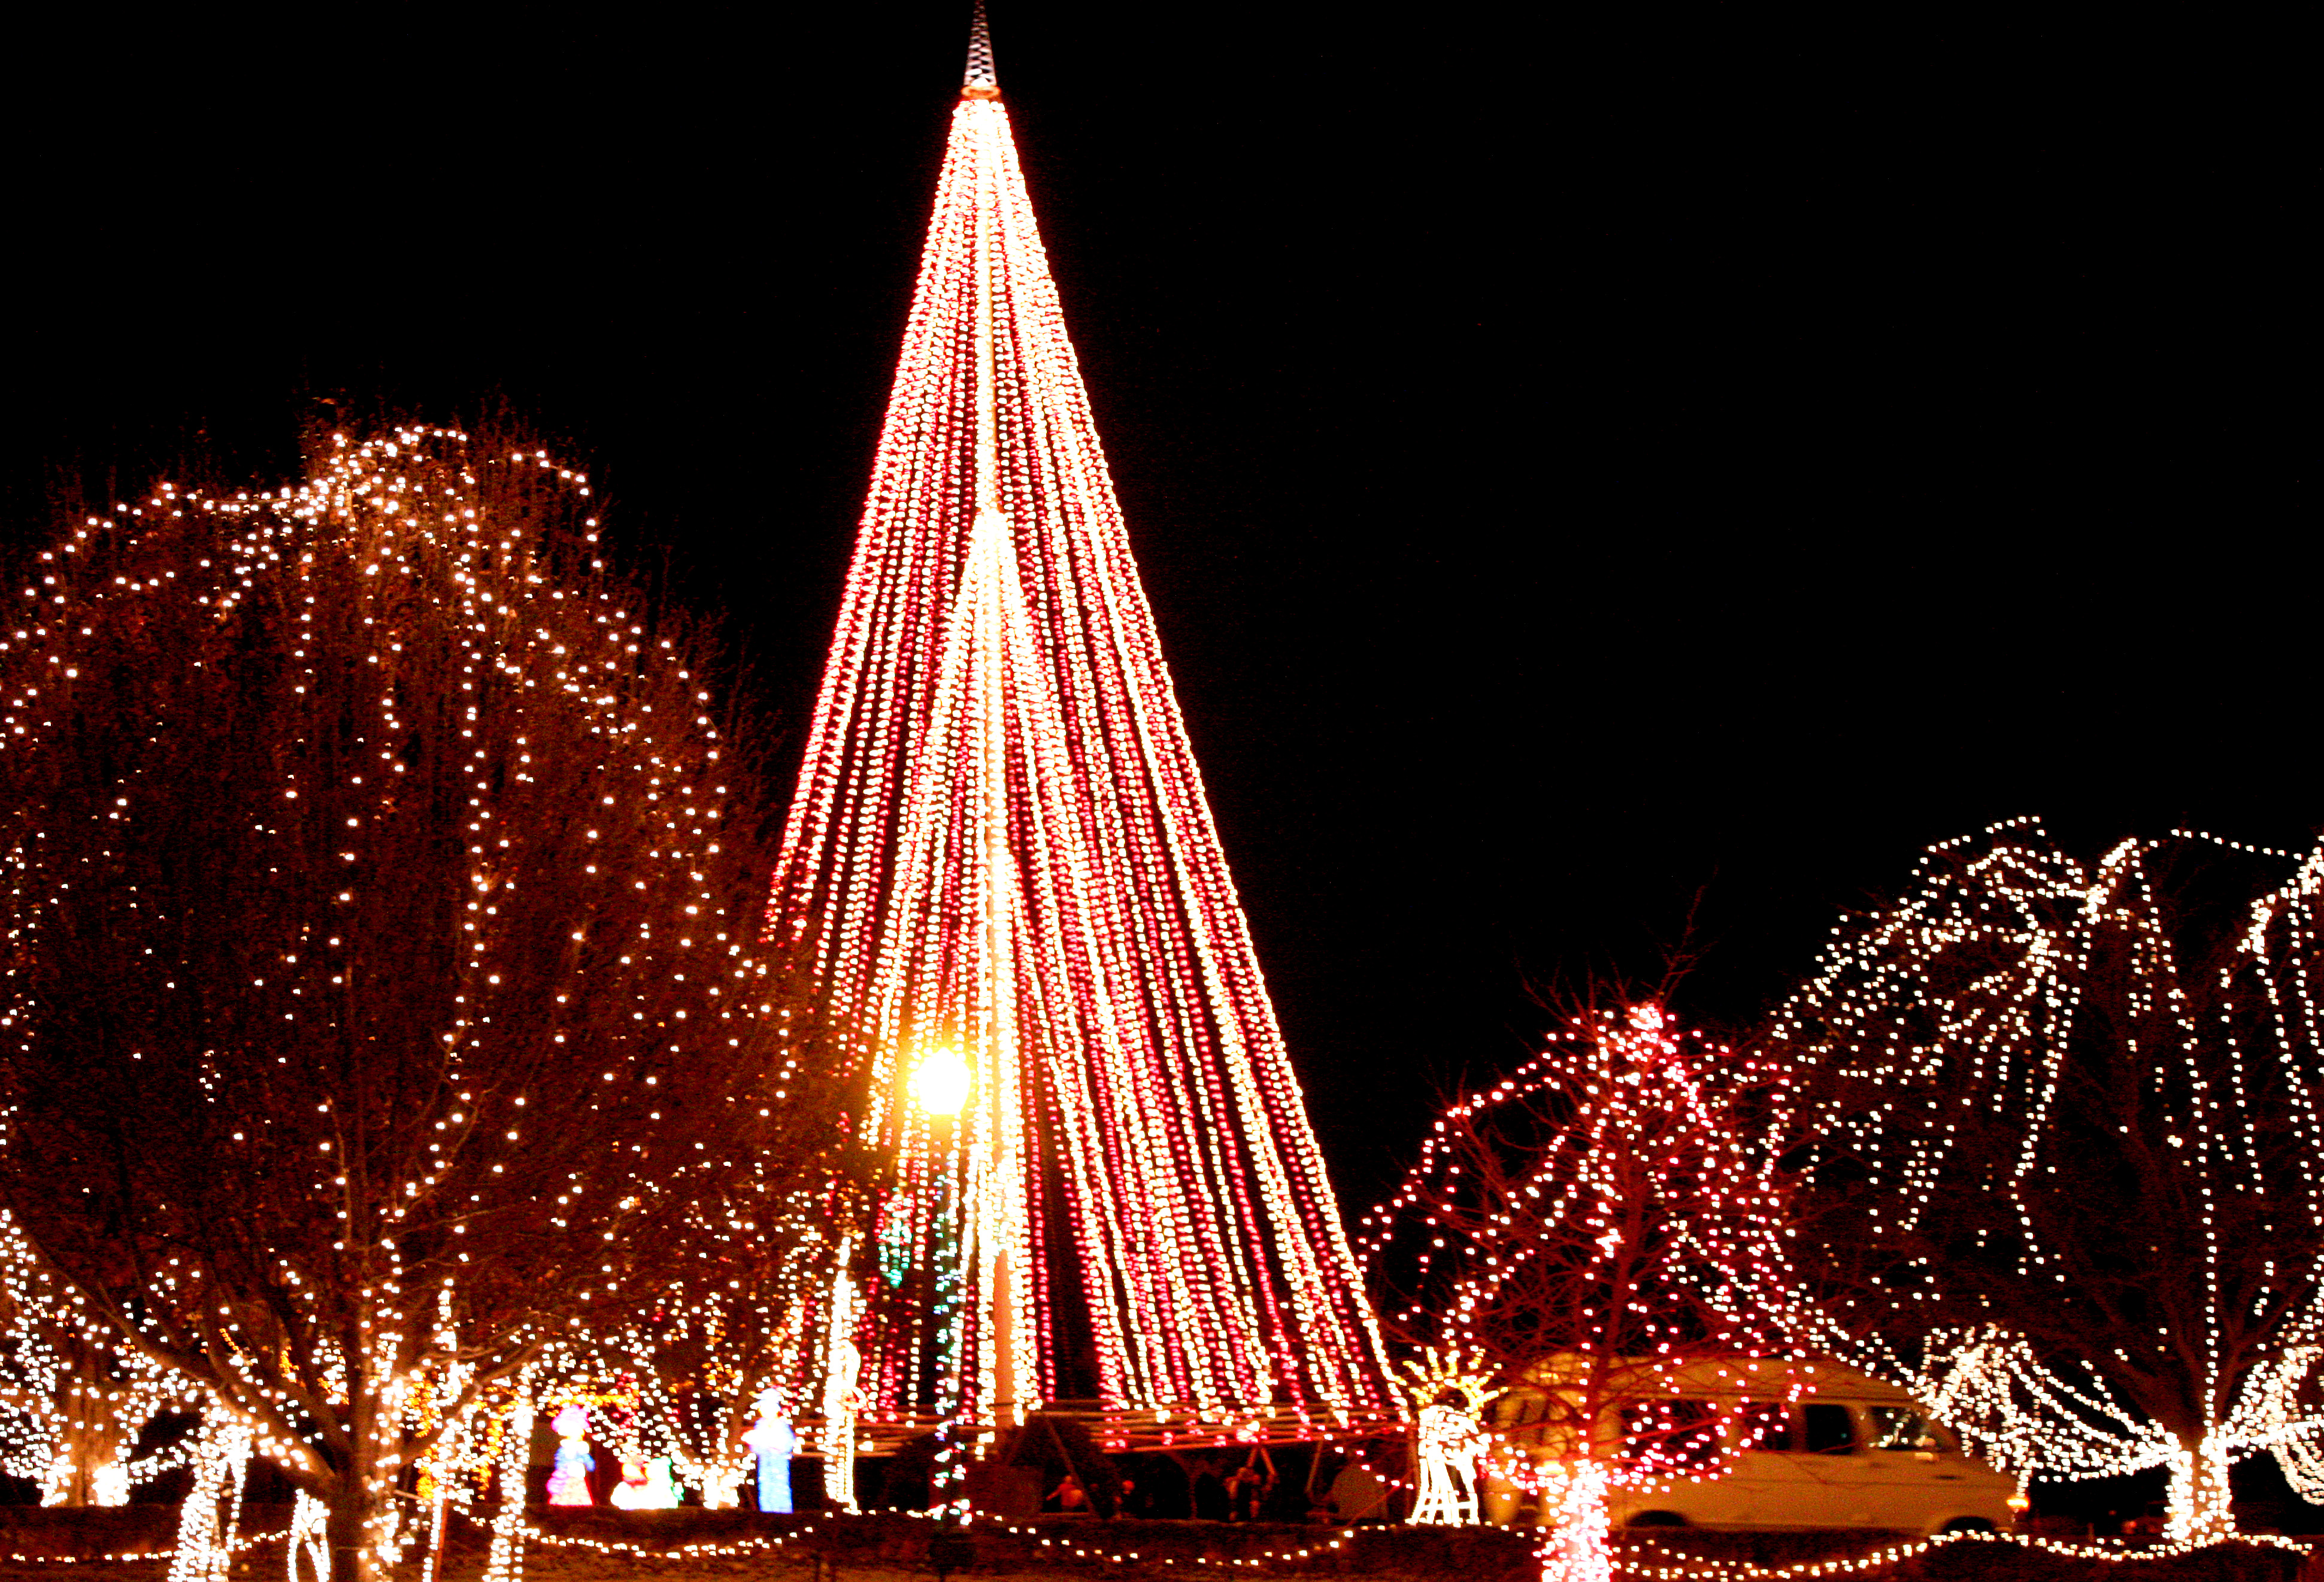 november edit festival of lights 4 - Chickasha Christmas Lights